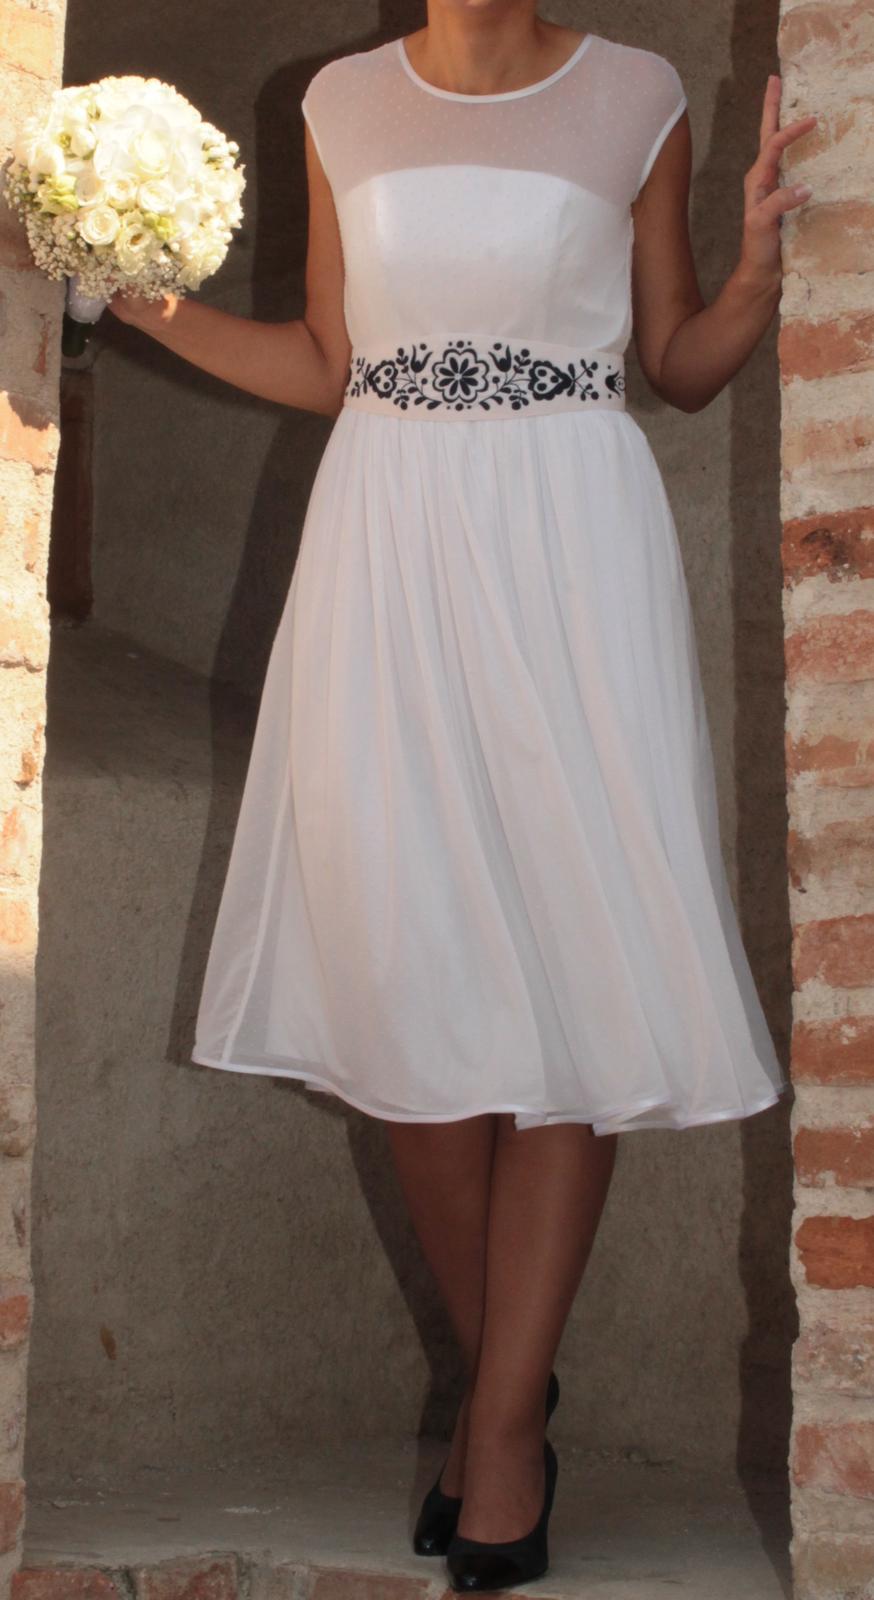 Krátke svadobné šaty 36/38 - Obrázok č. 1